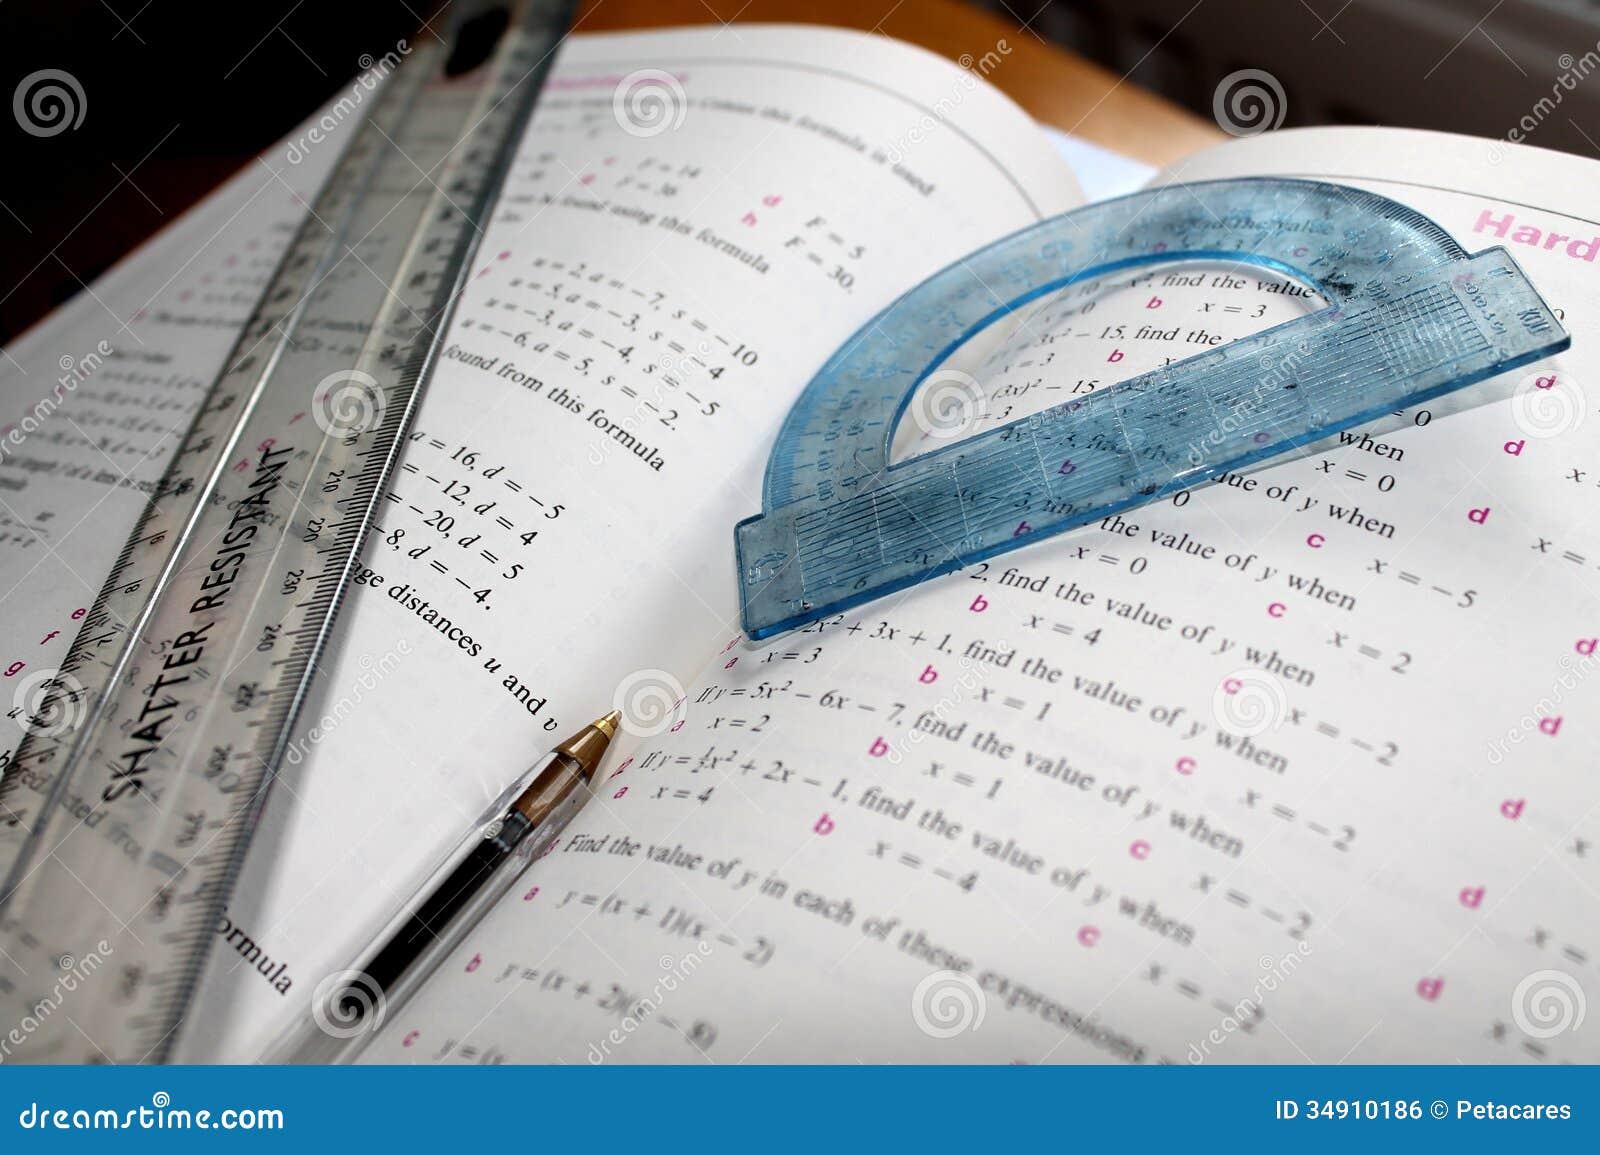 booksarefreeweeblycom Tmh Mathematics